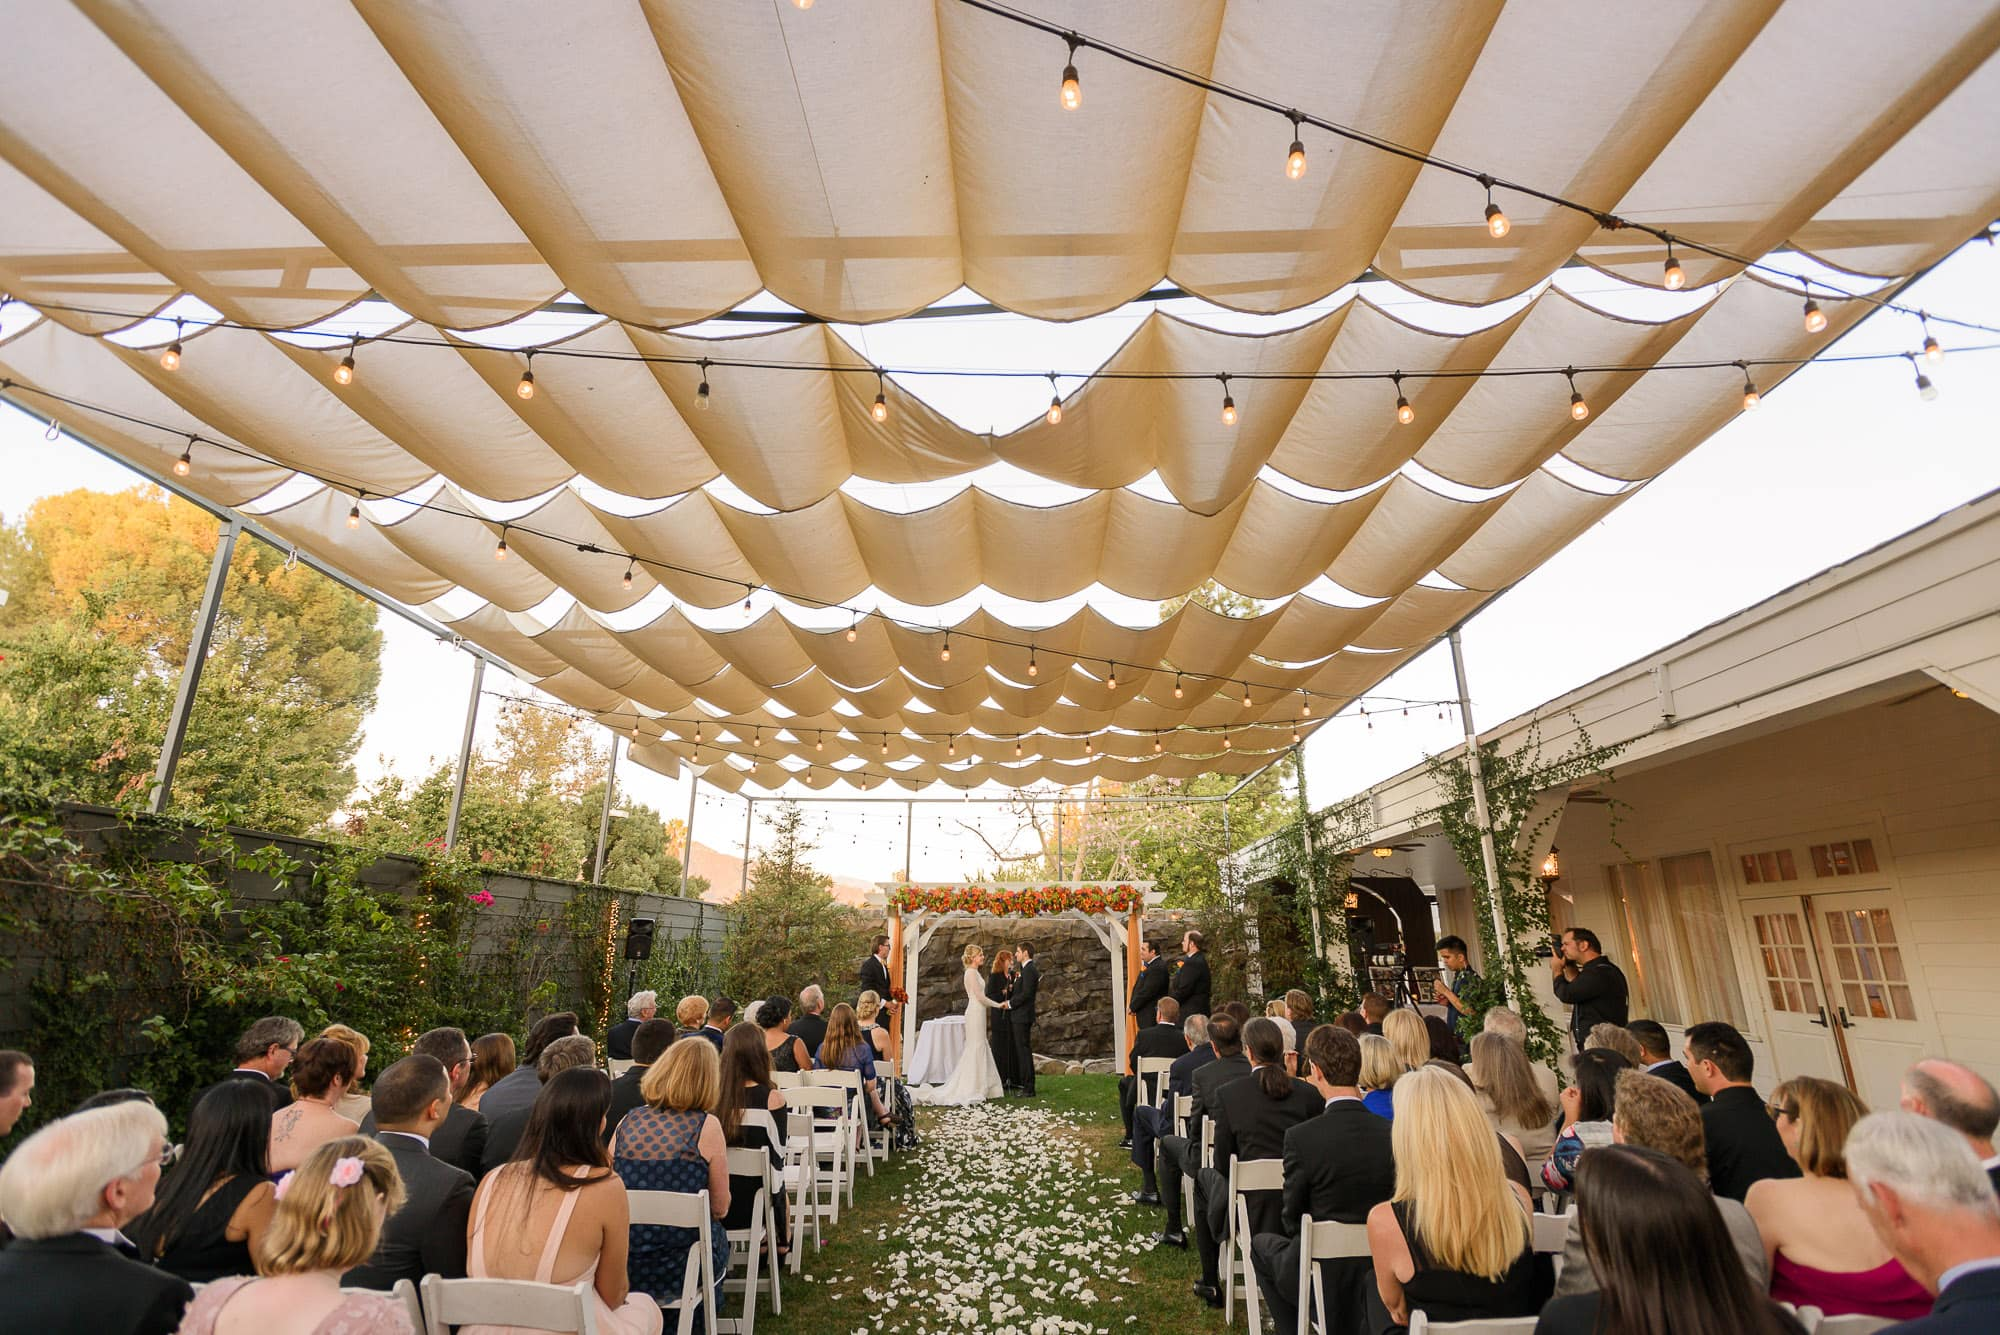 047_Alan_and_Heidi_Los_Angeles_Equestrian_Center_Wedding